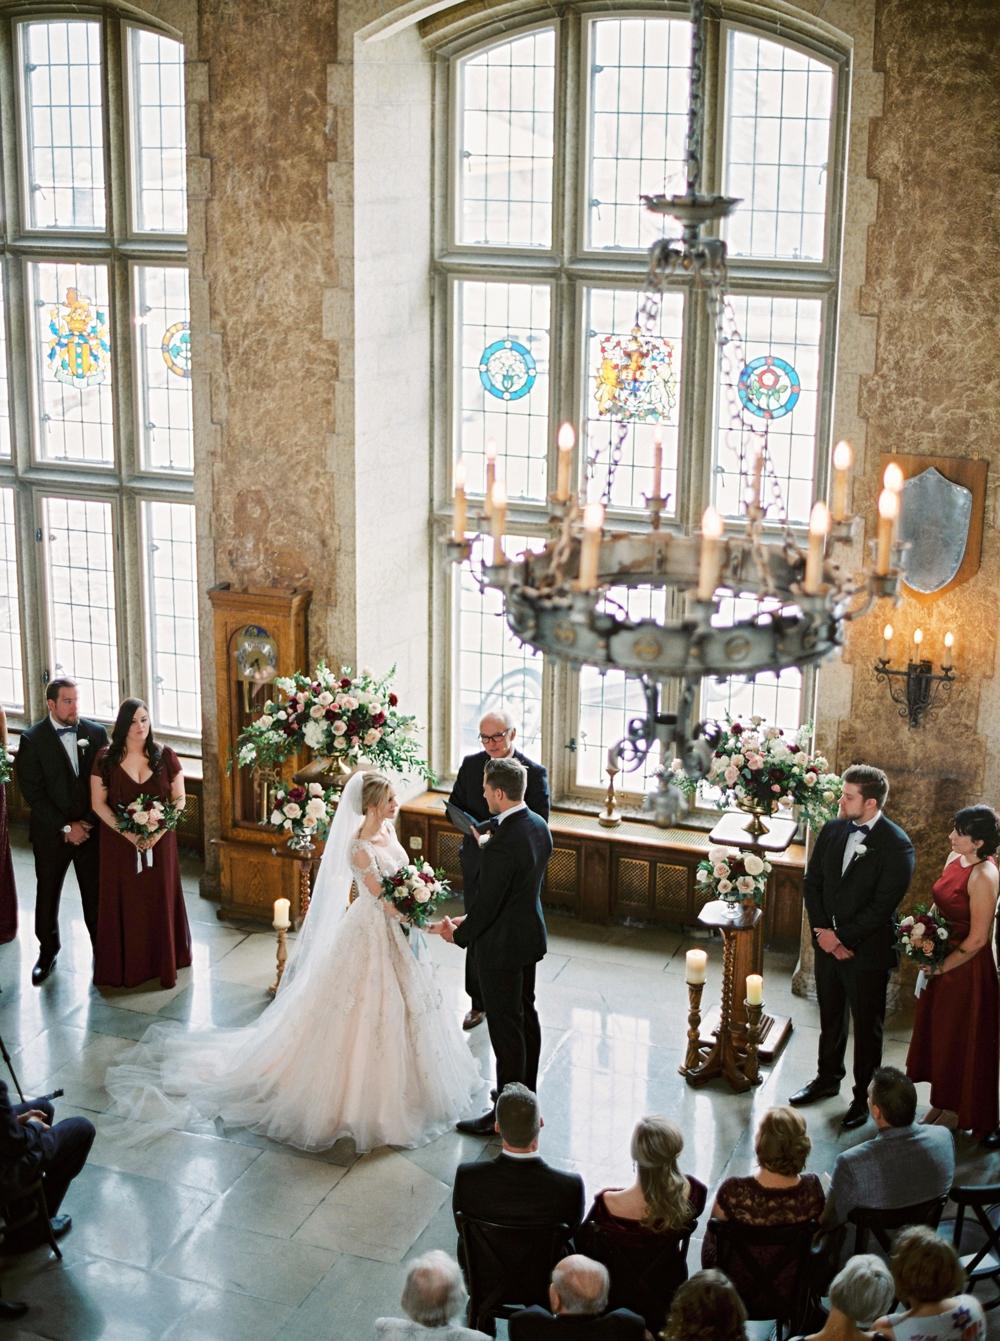 Calgary Wedding Photographers | Banff Wedding Photographer | Fairmont Hotel Banff Springs Hotel | Winter Wonderland Wedding | Mt Stephen Hall Banff Wedding